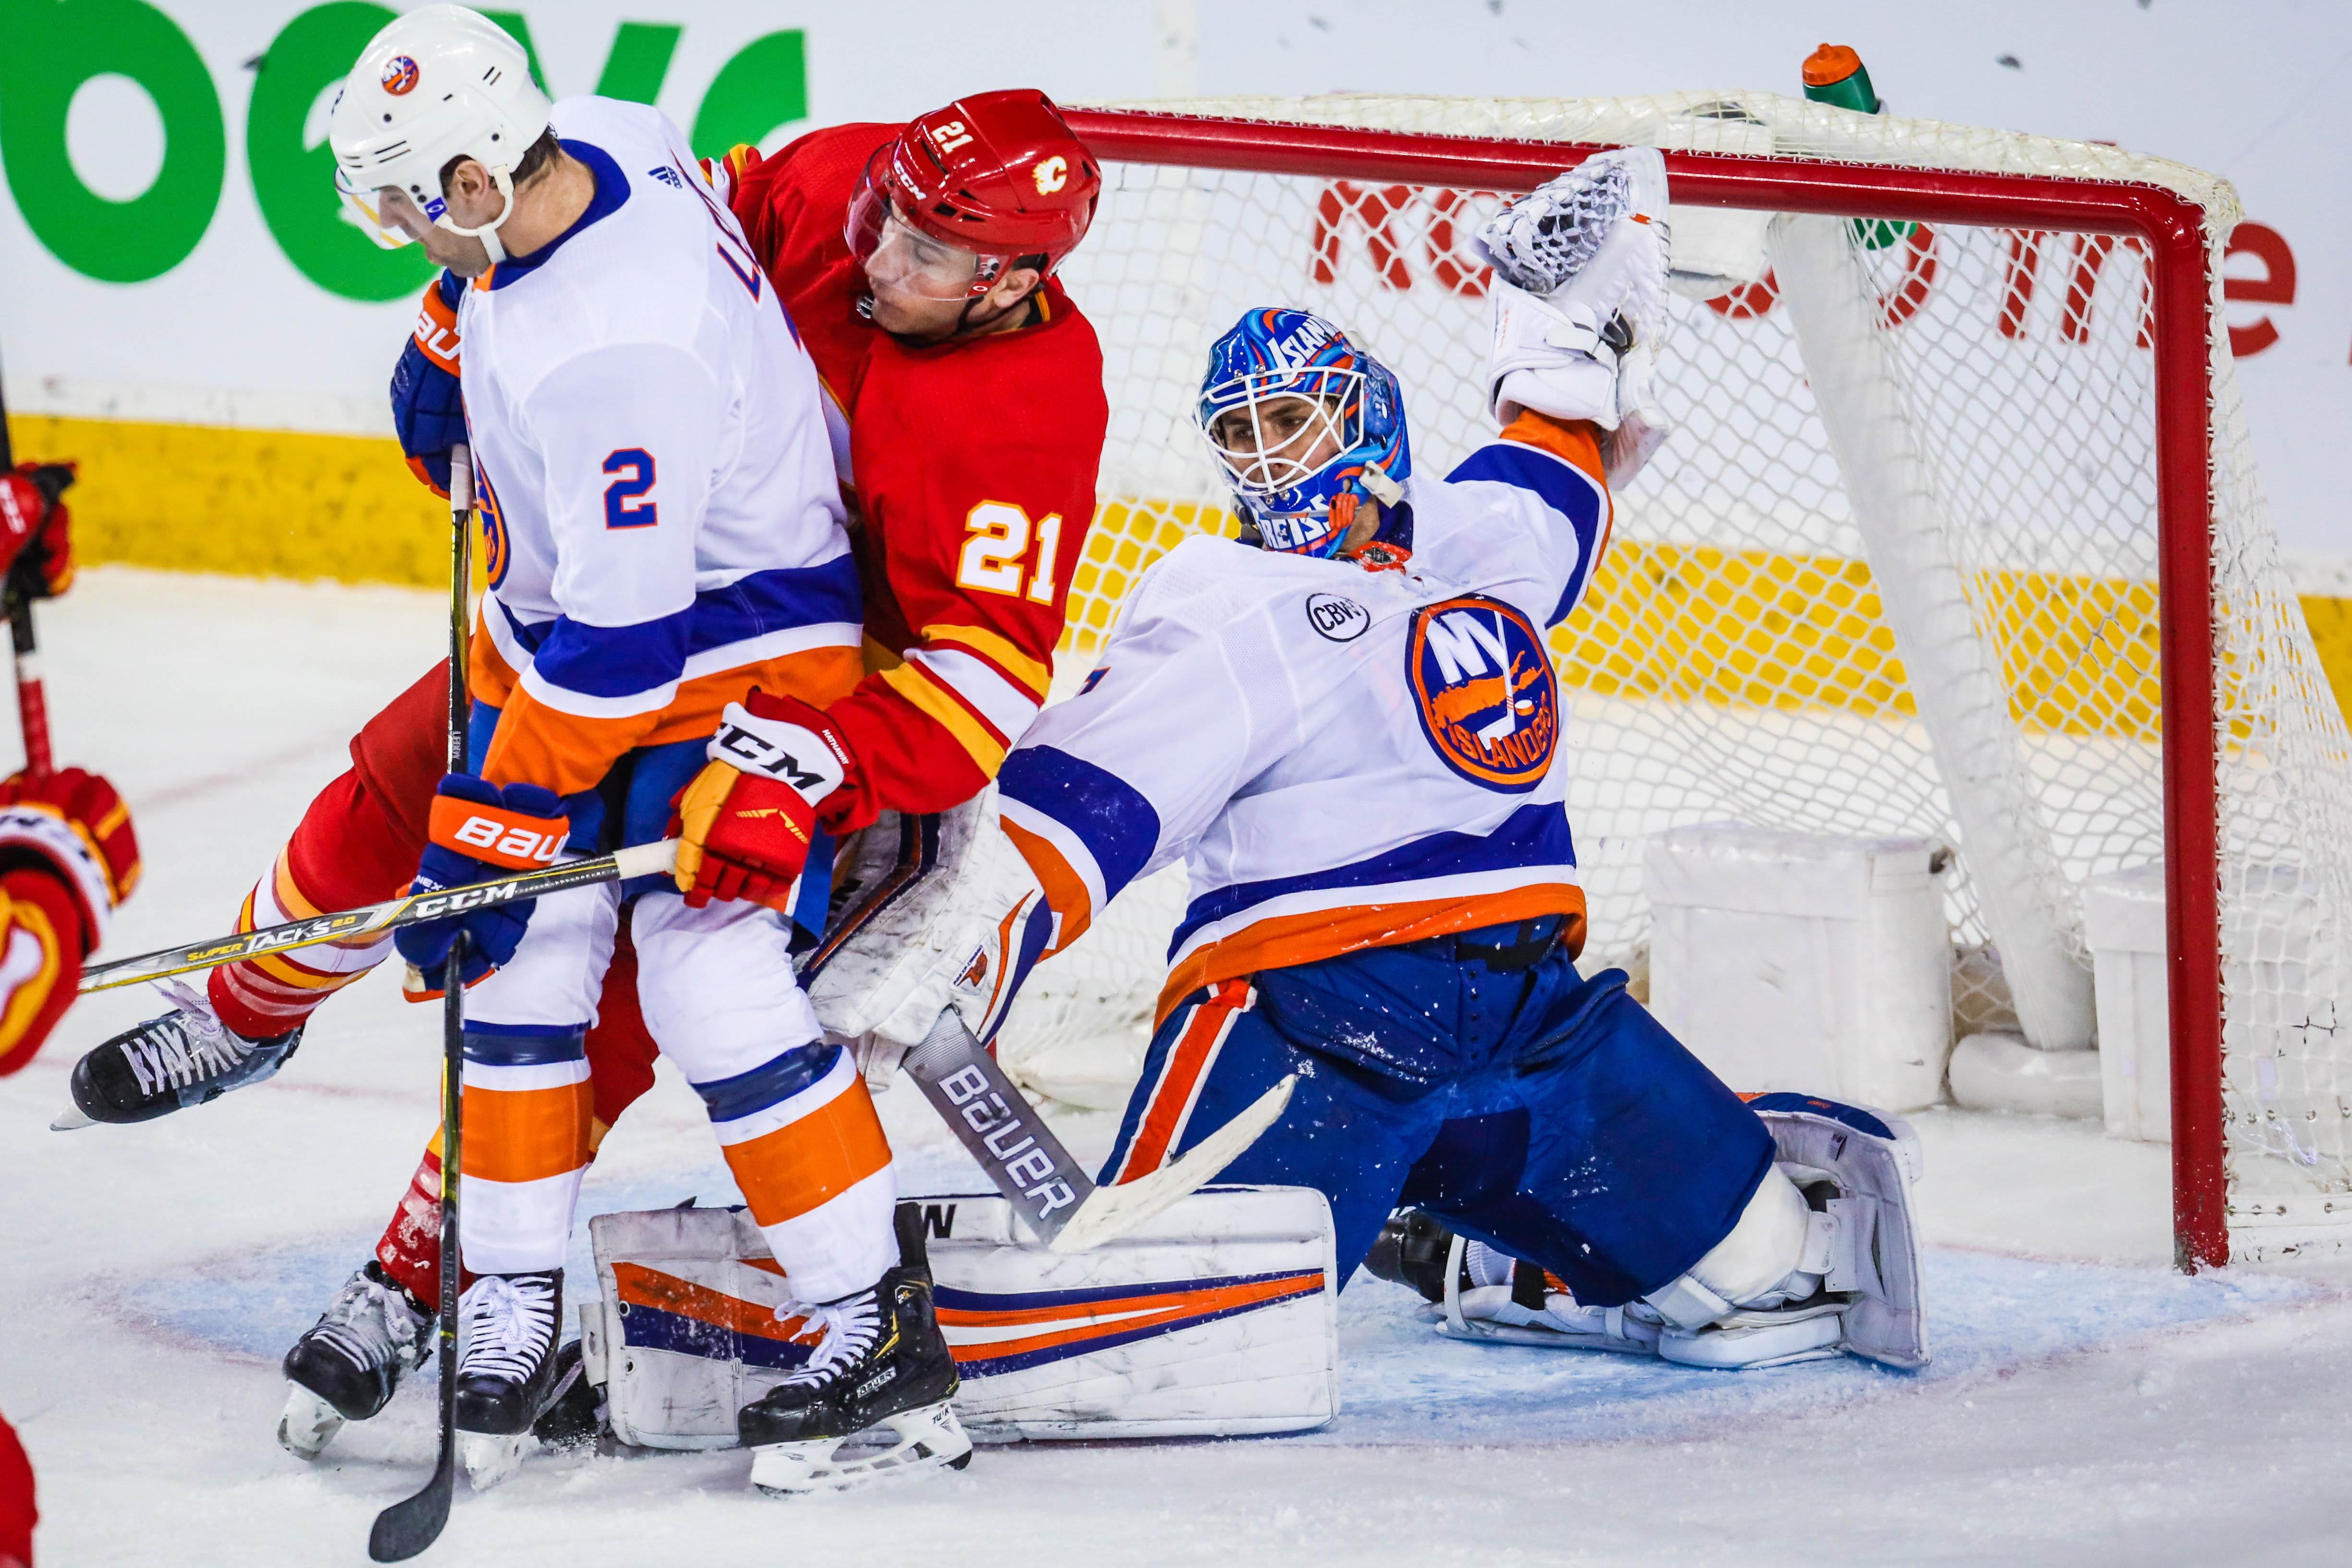 Islanders flameout in 4-2 loss to Calgary